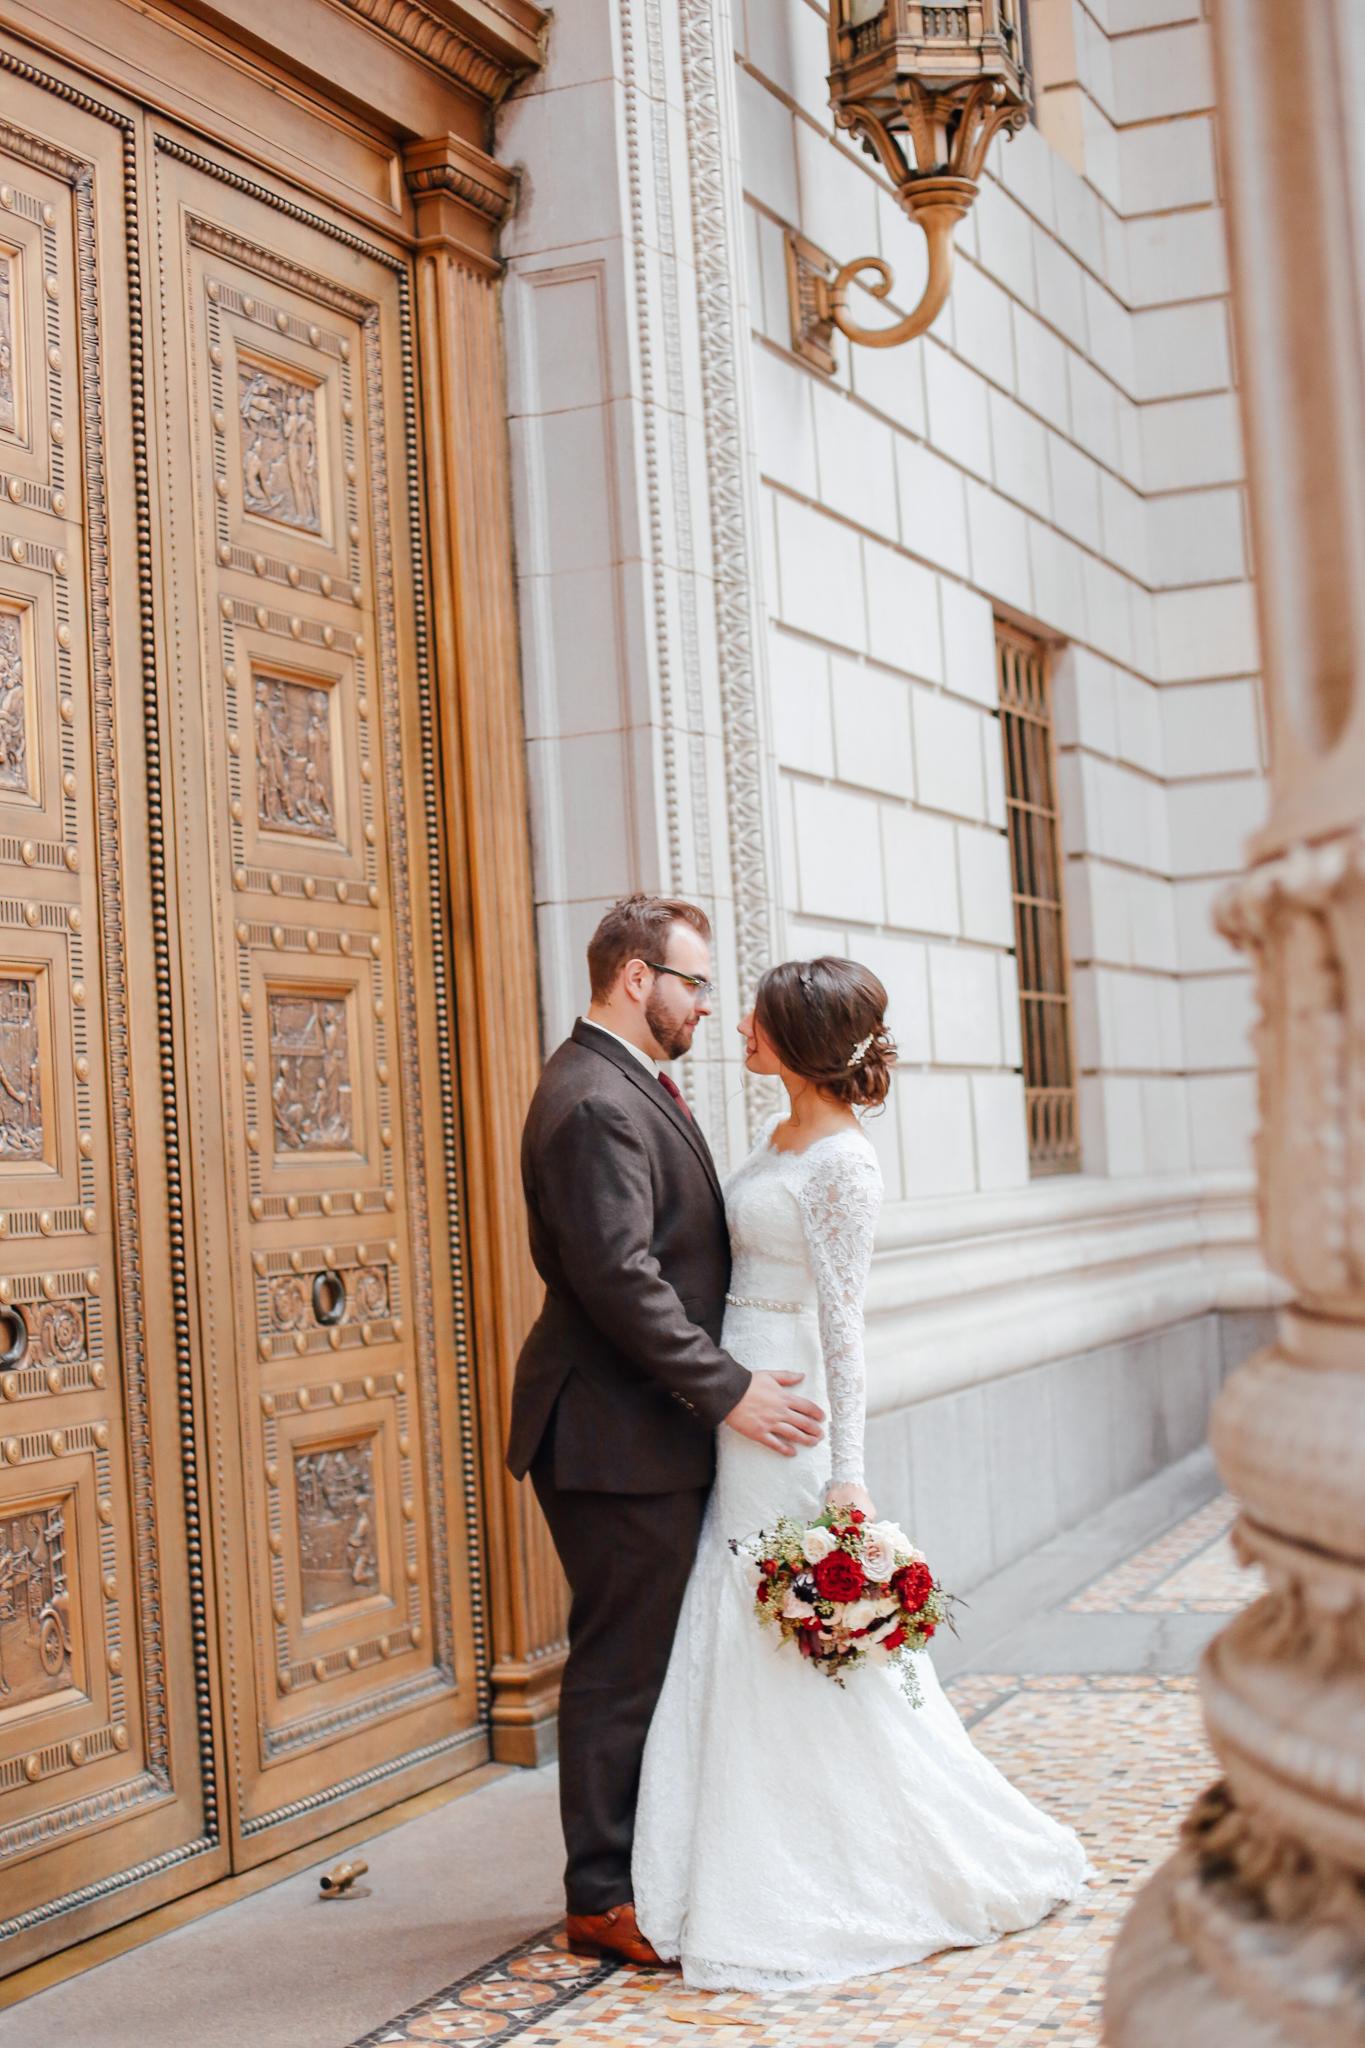 Manu and Laura - Portland Wedding Photographer - 64.jpg